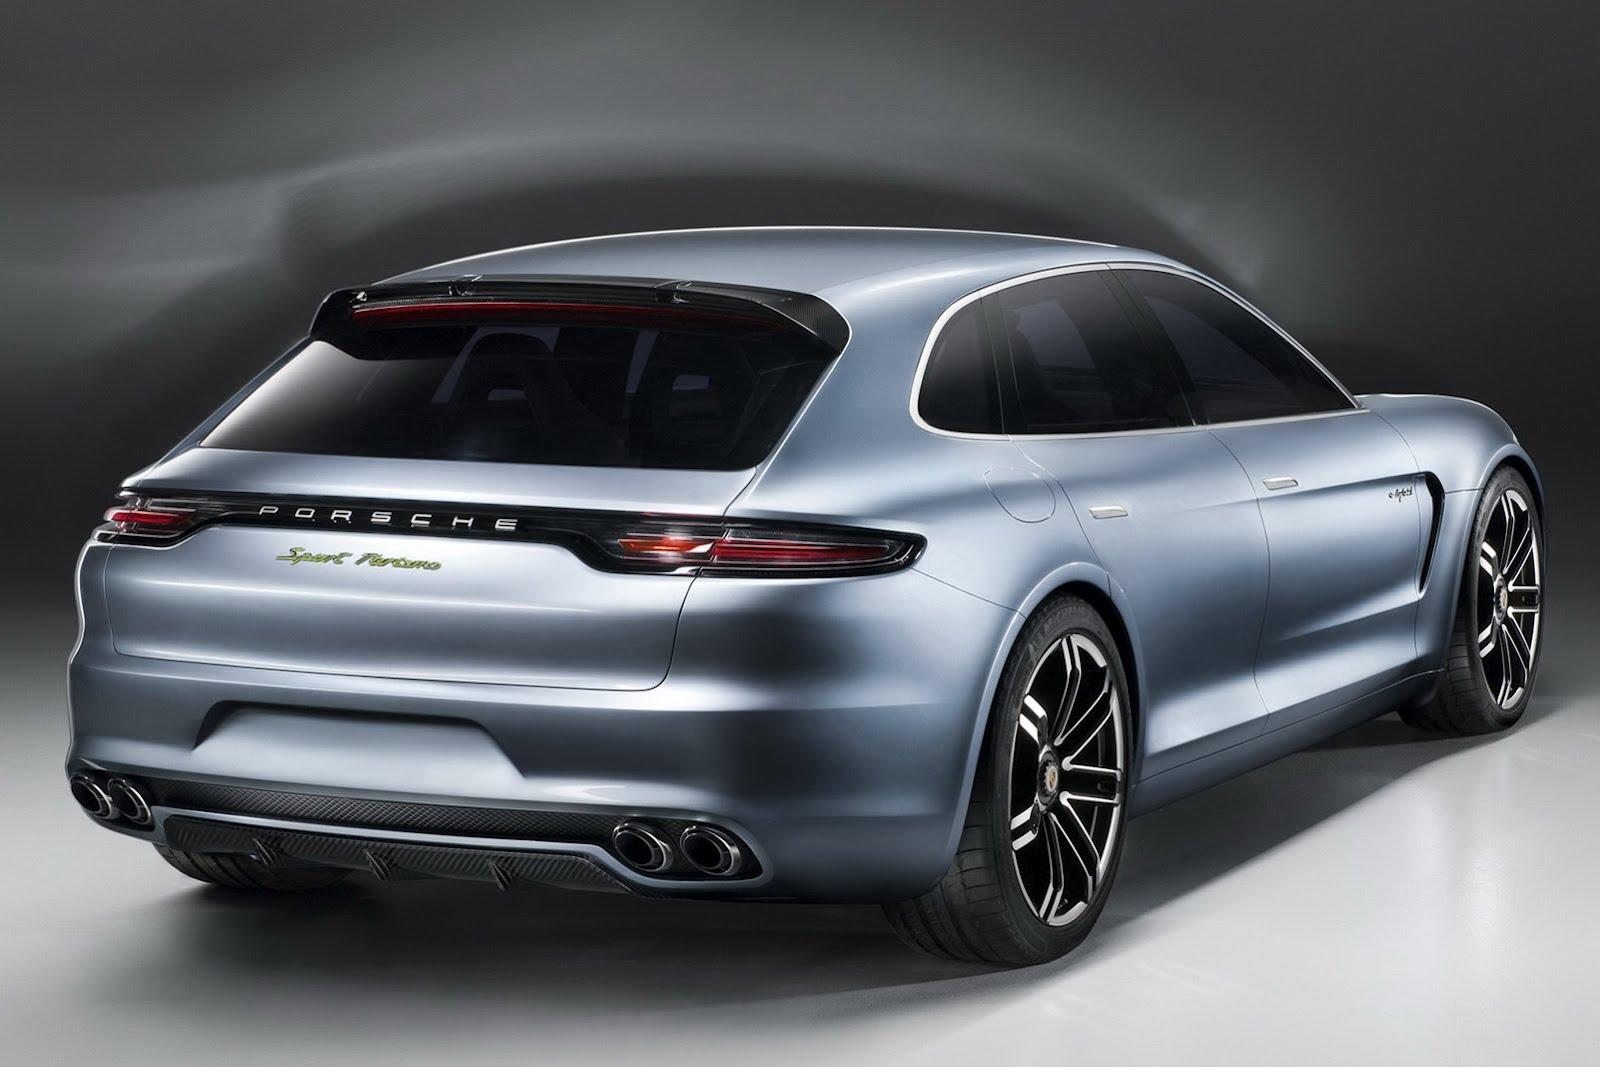 New Porsche Panamera Sport Turismo Concept Previews Next Sedan and Wallpapers HD